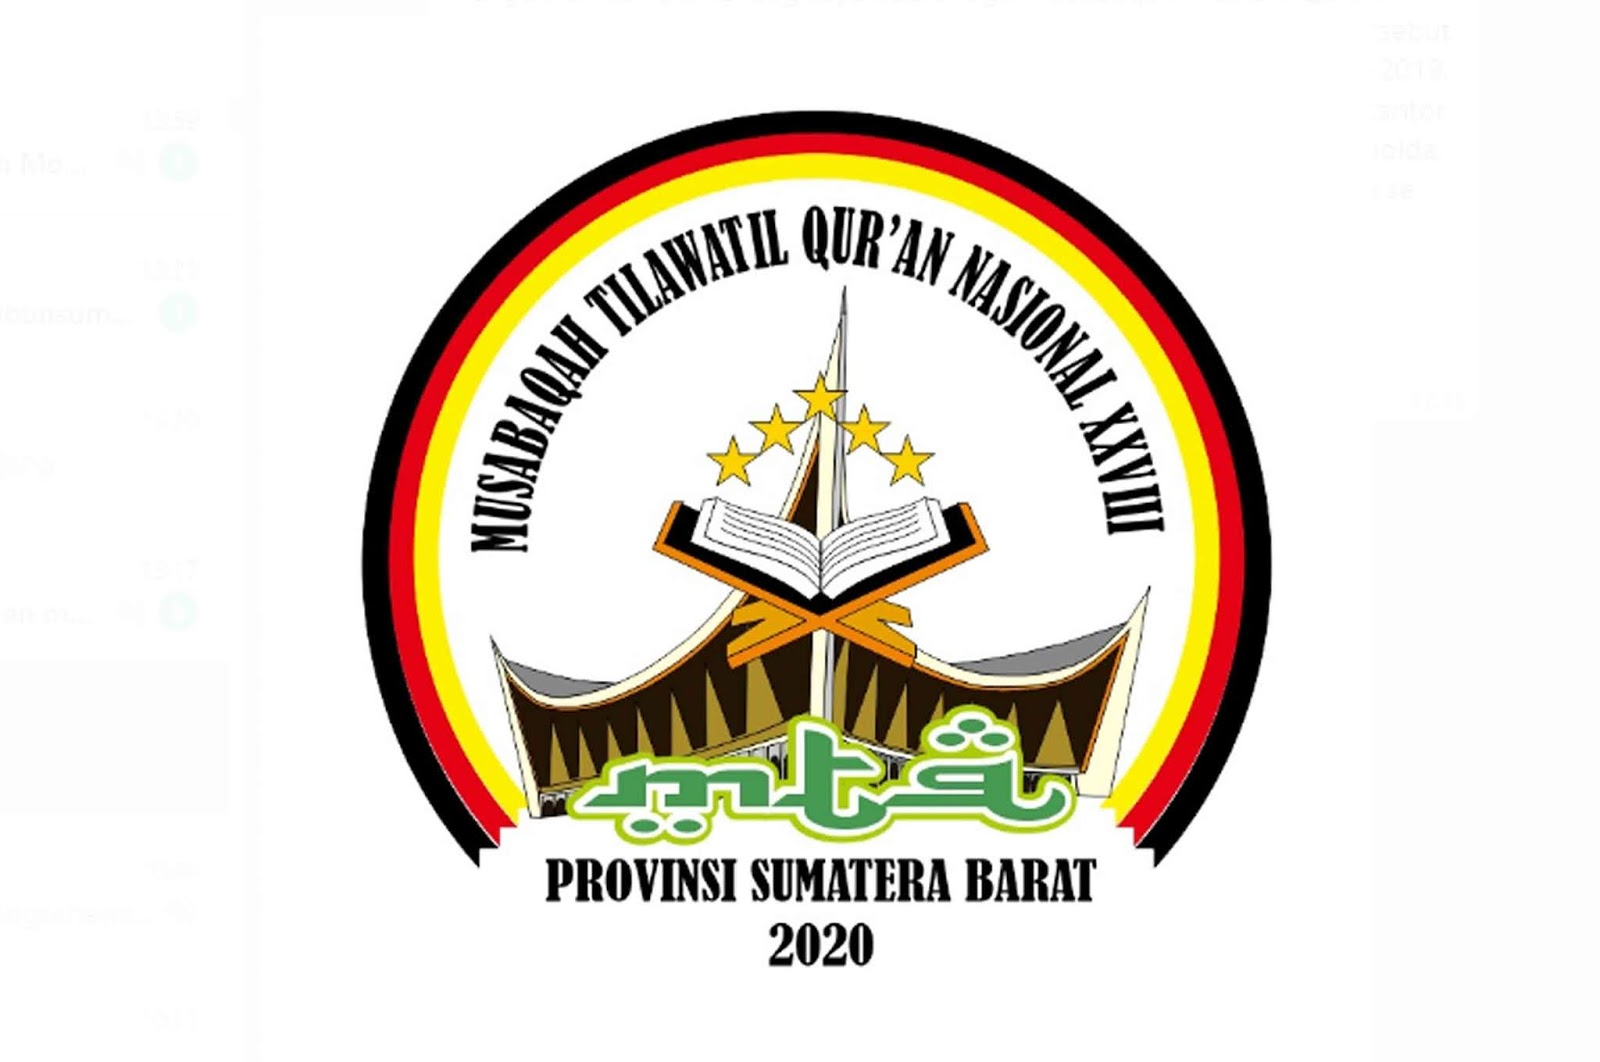 Logo MTQ Nasional ke XXVIII atau ke 28 Tahun 2020 Provinsi Sumatera Barat jadi tuan rumah